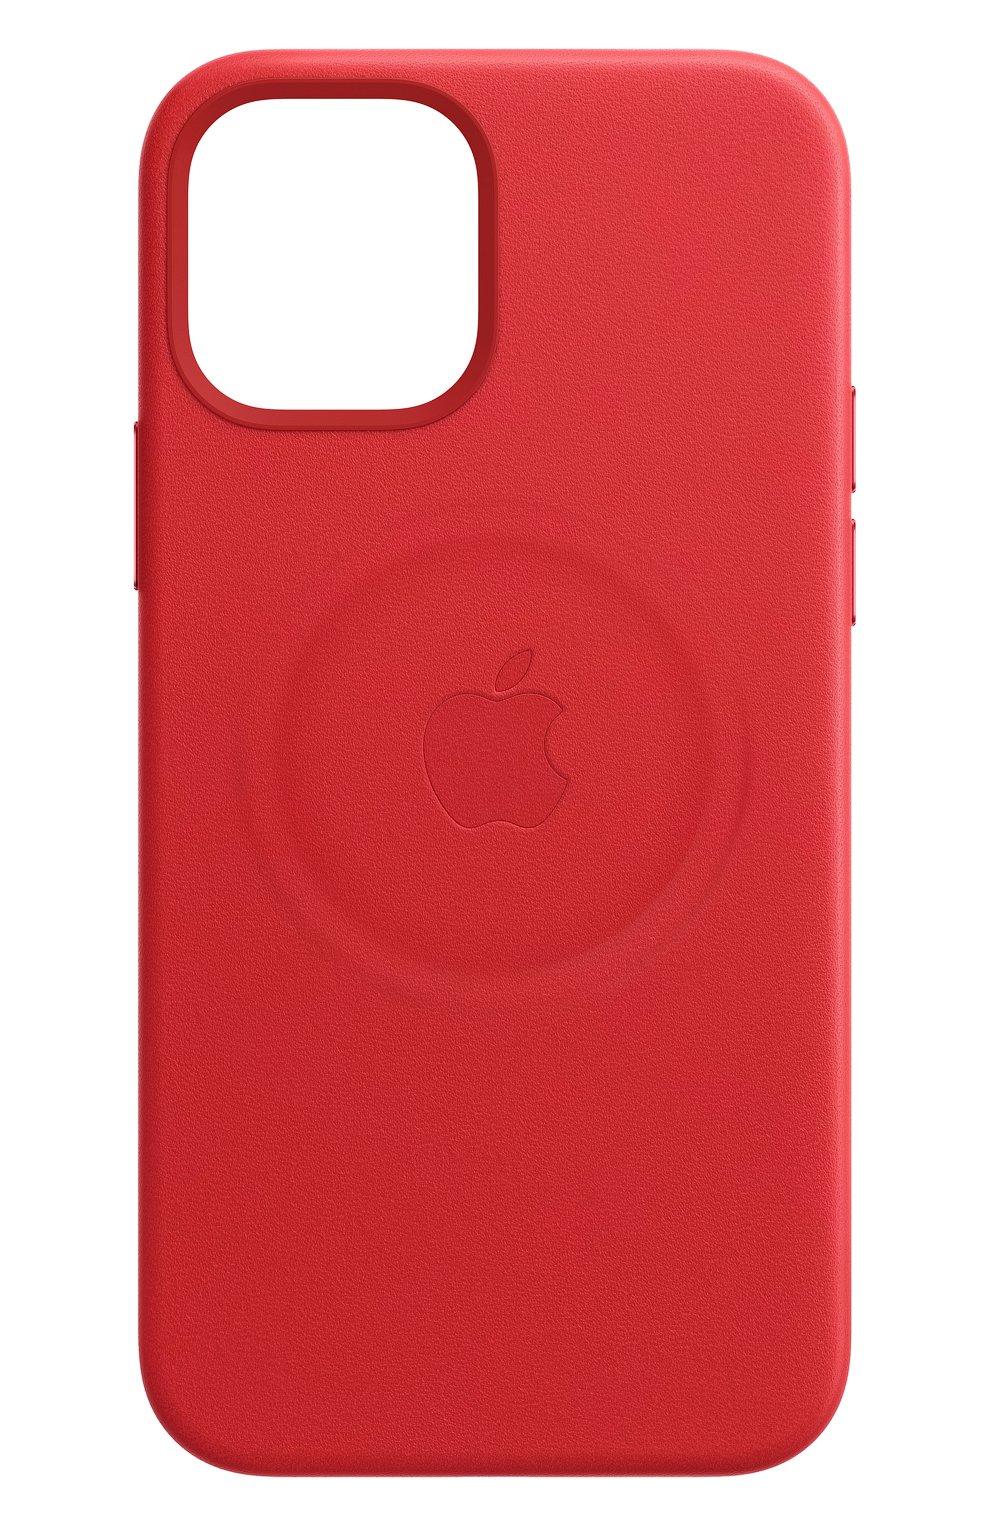 Чехол magsafe для iphone 12/12 pro APPLE  (product)red цвета, арт. MHKD3ZE/A | Фото 1